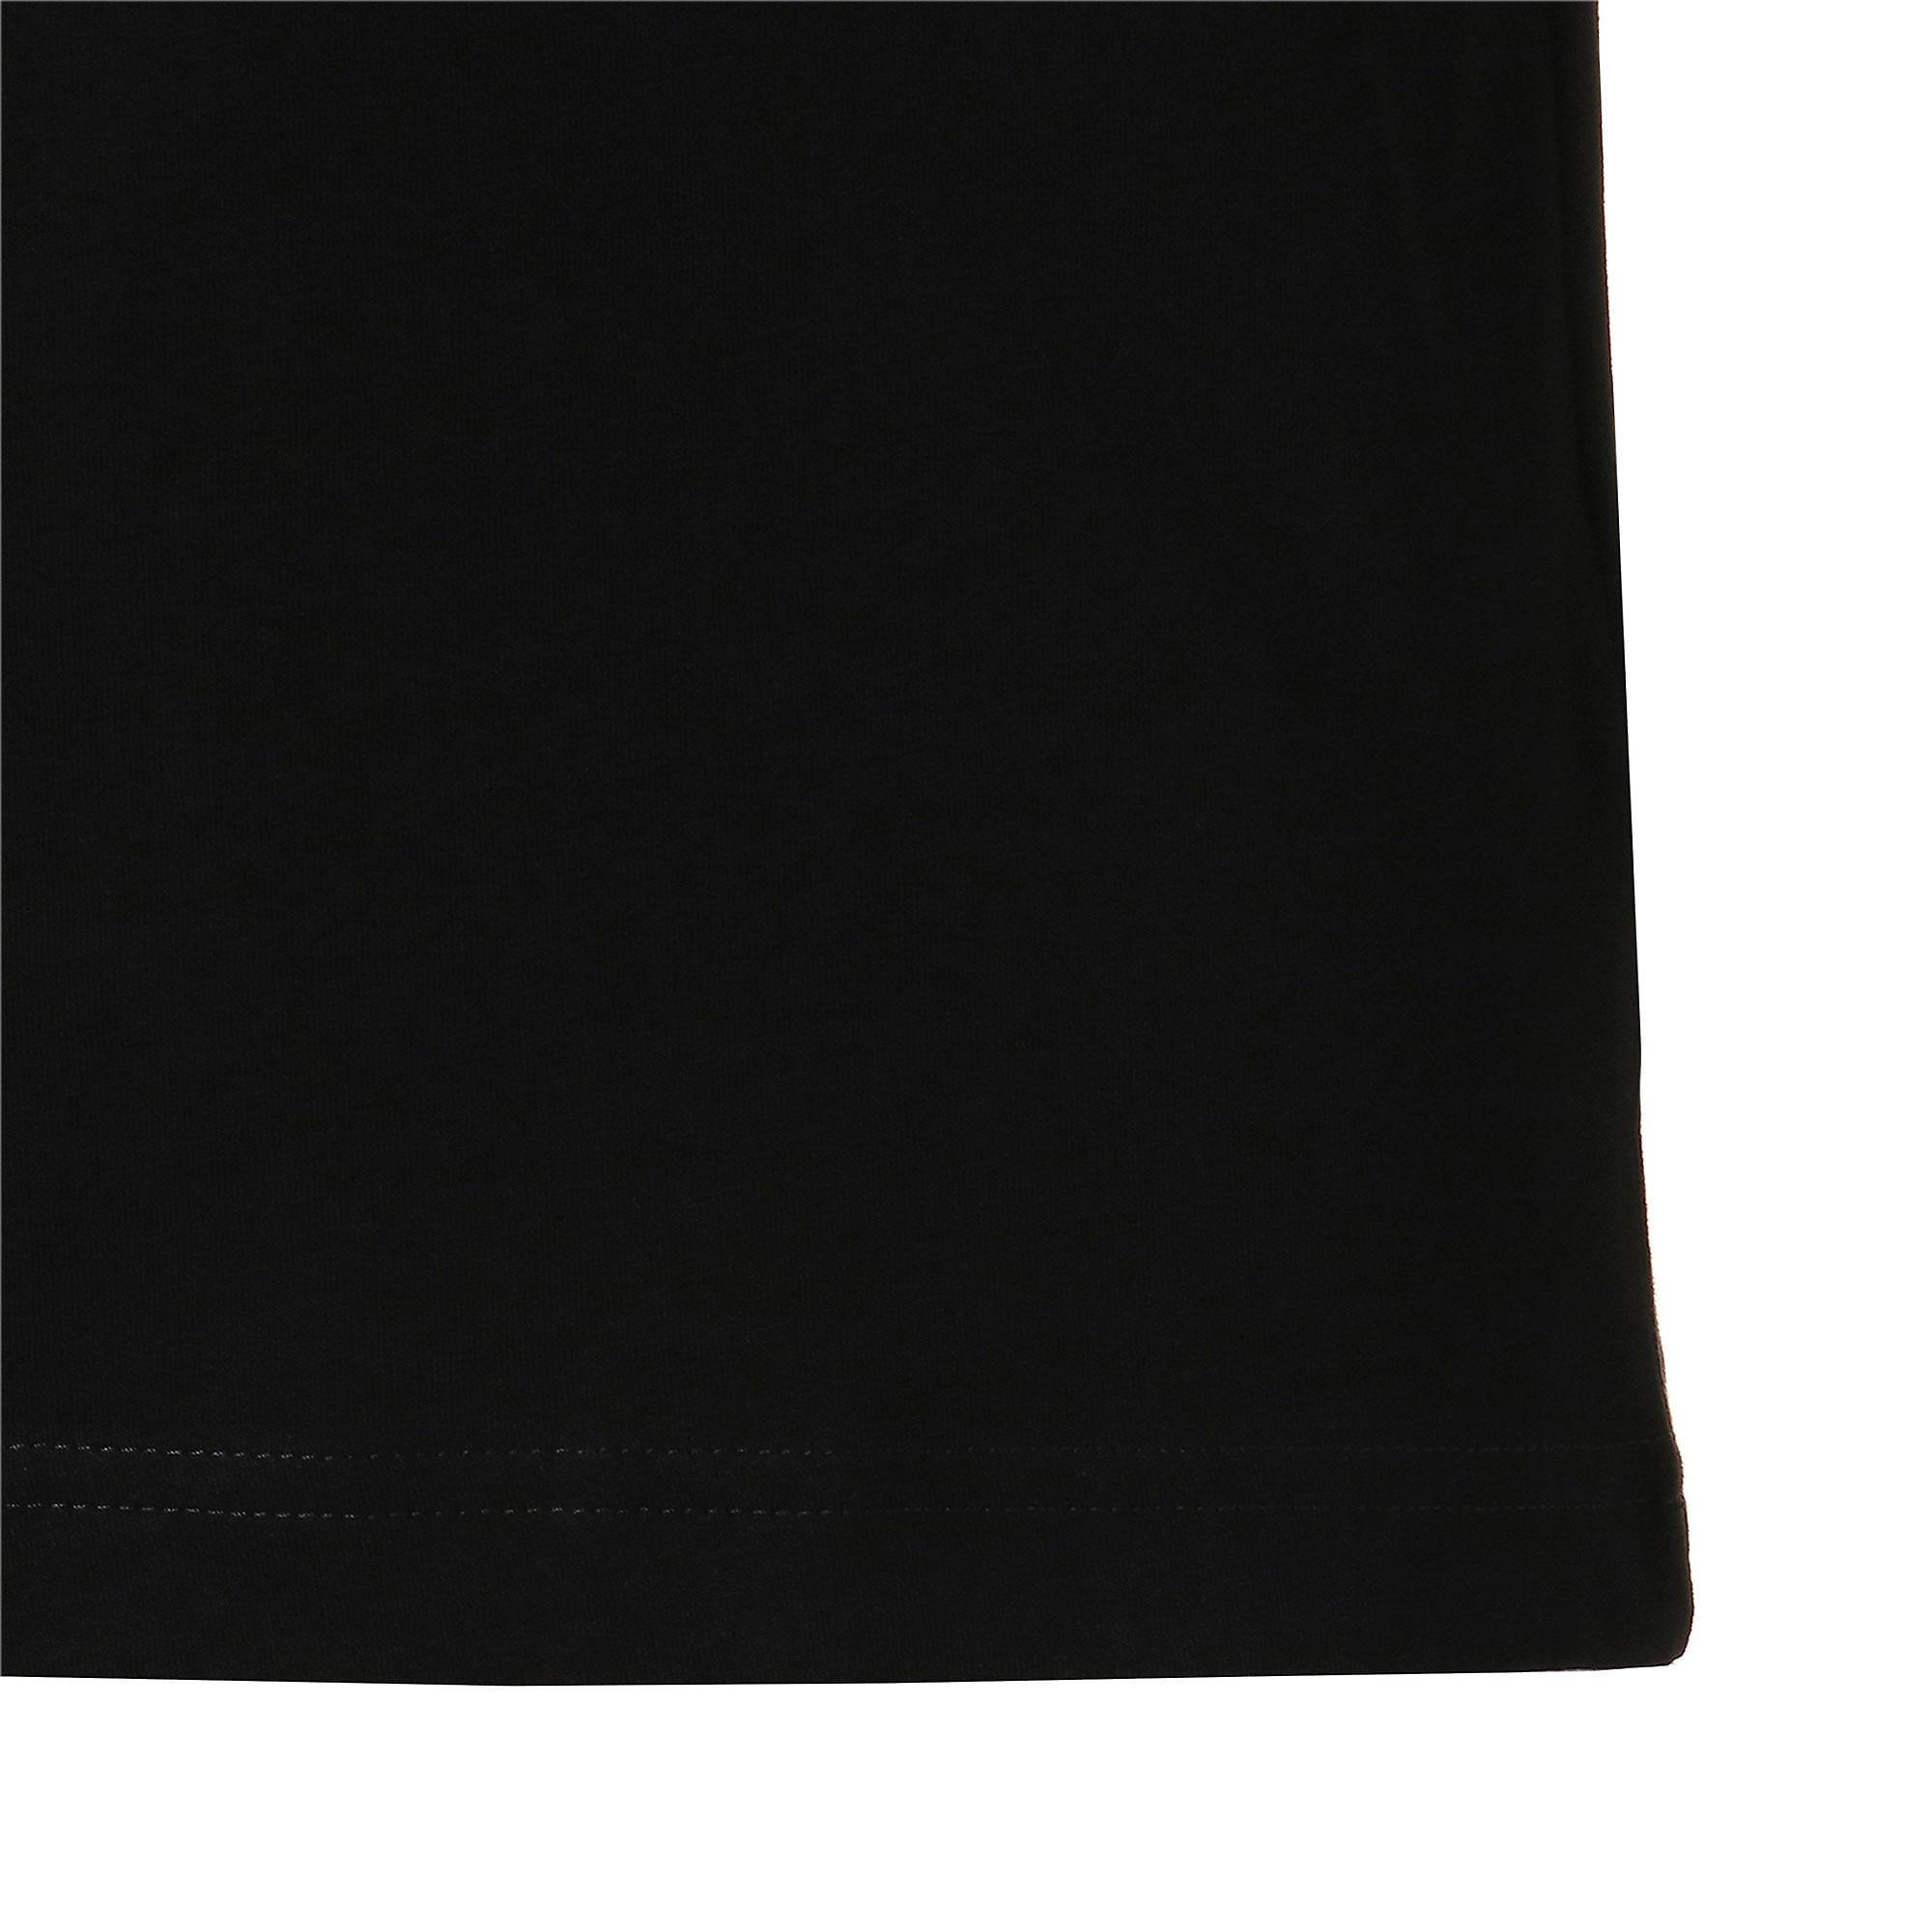 Thumbnail 9 of ICONIC MCS SS Tシャツ 半袖, Puma Black, medium-JPN